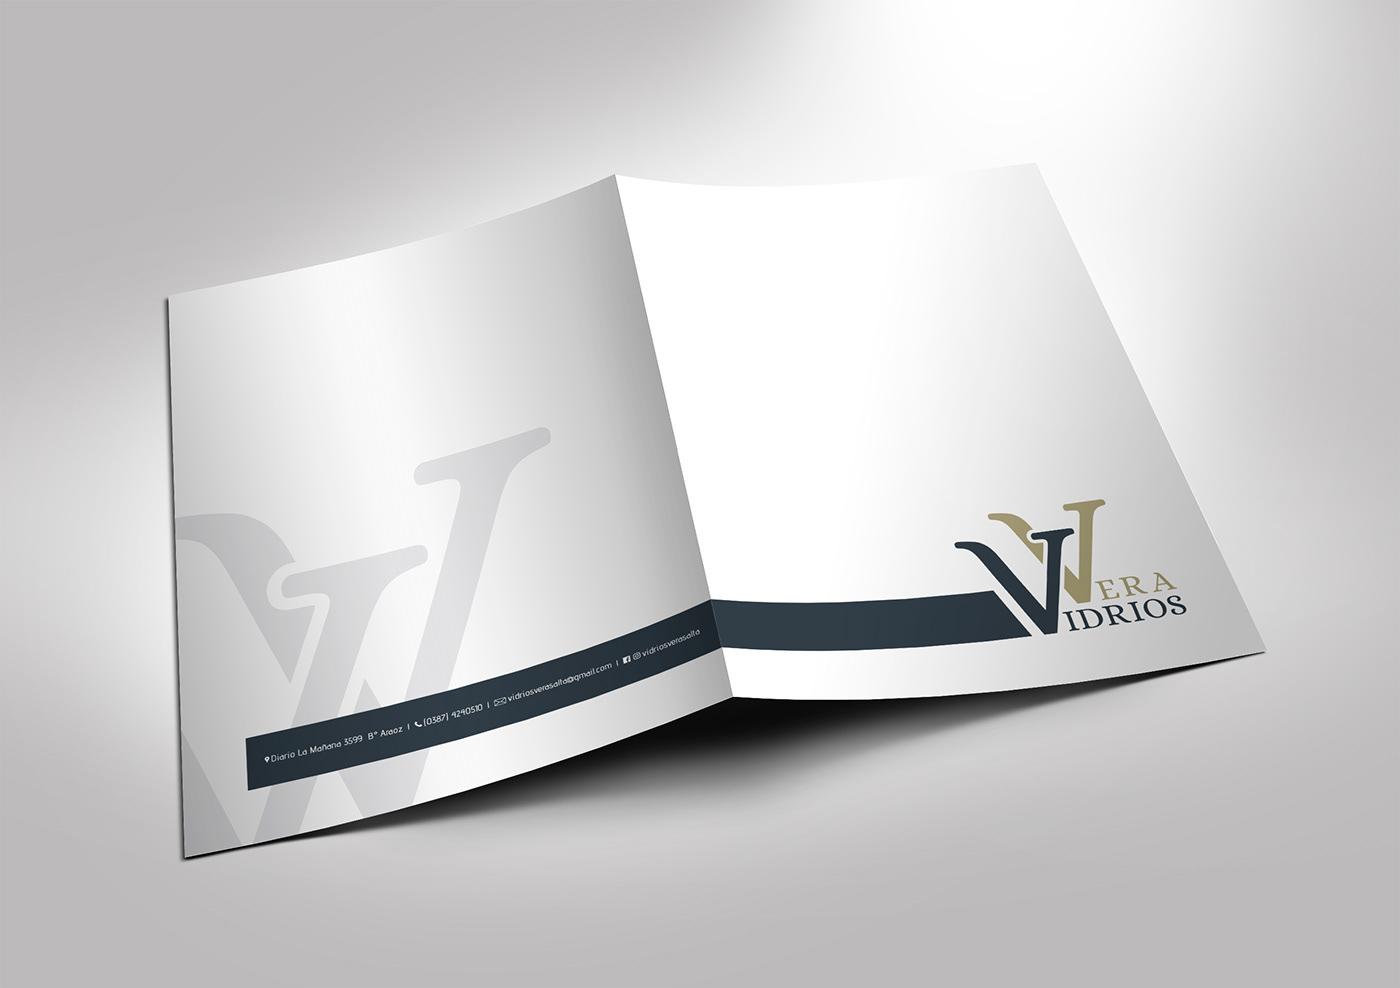 carpeta institucional Illustrator logo Manual de Marca tarjetas personales